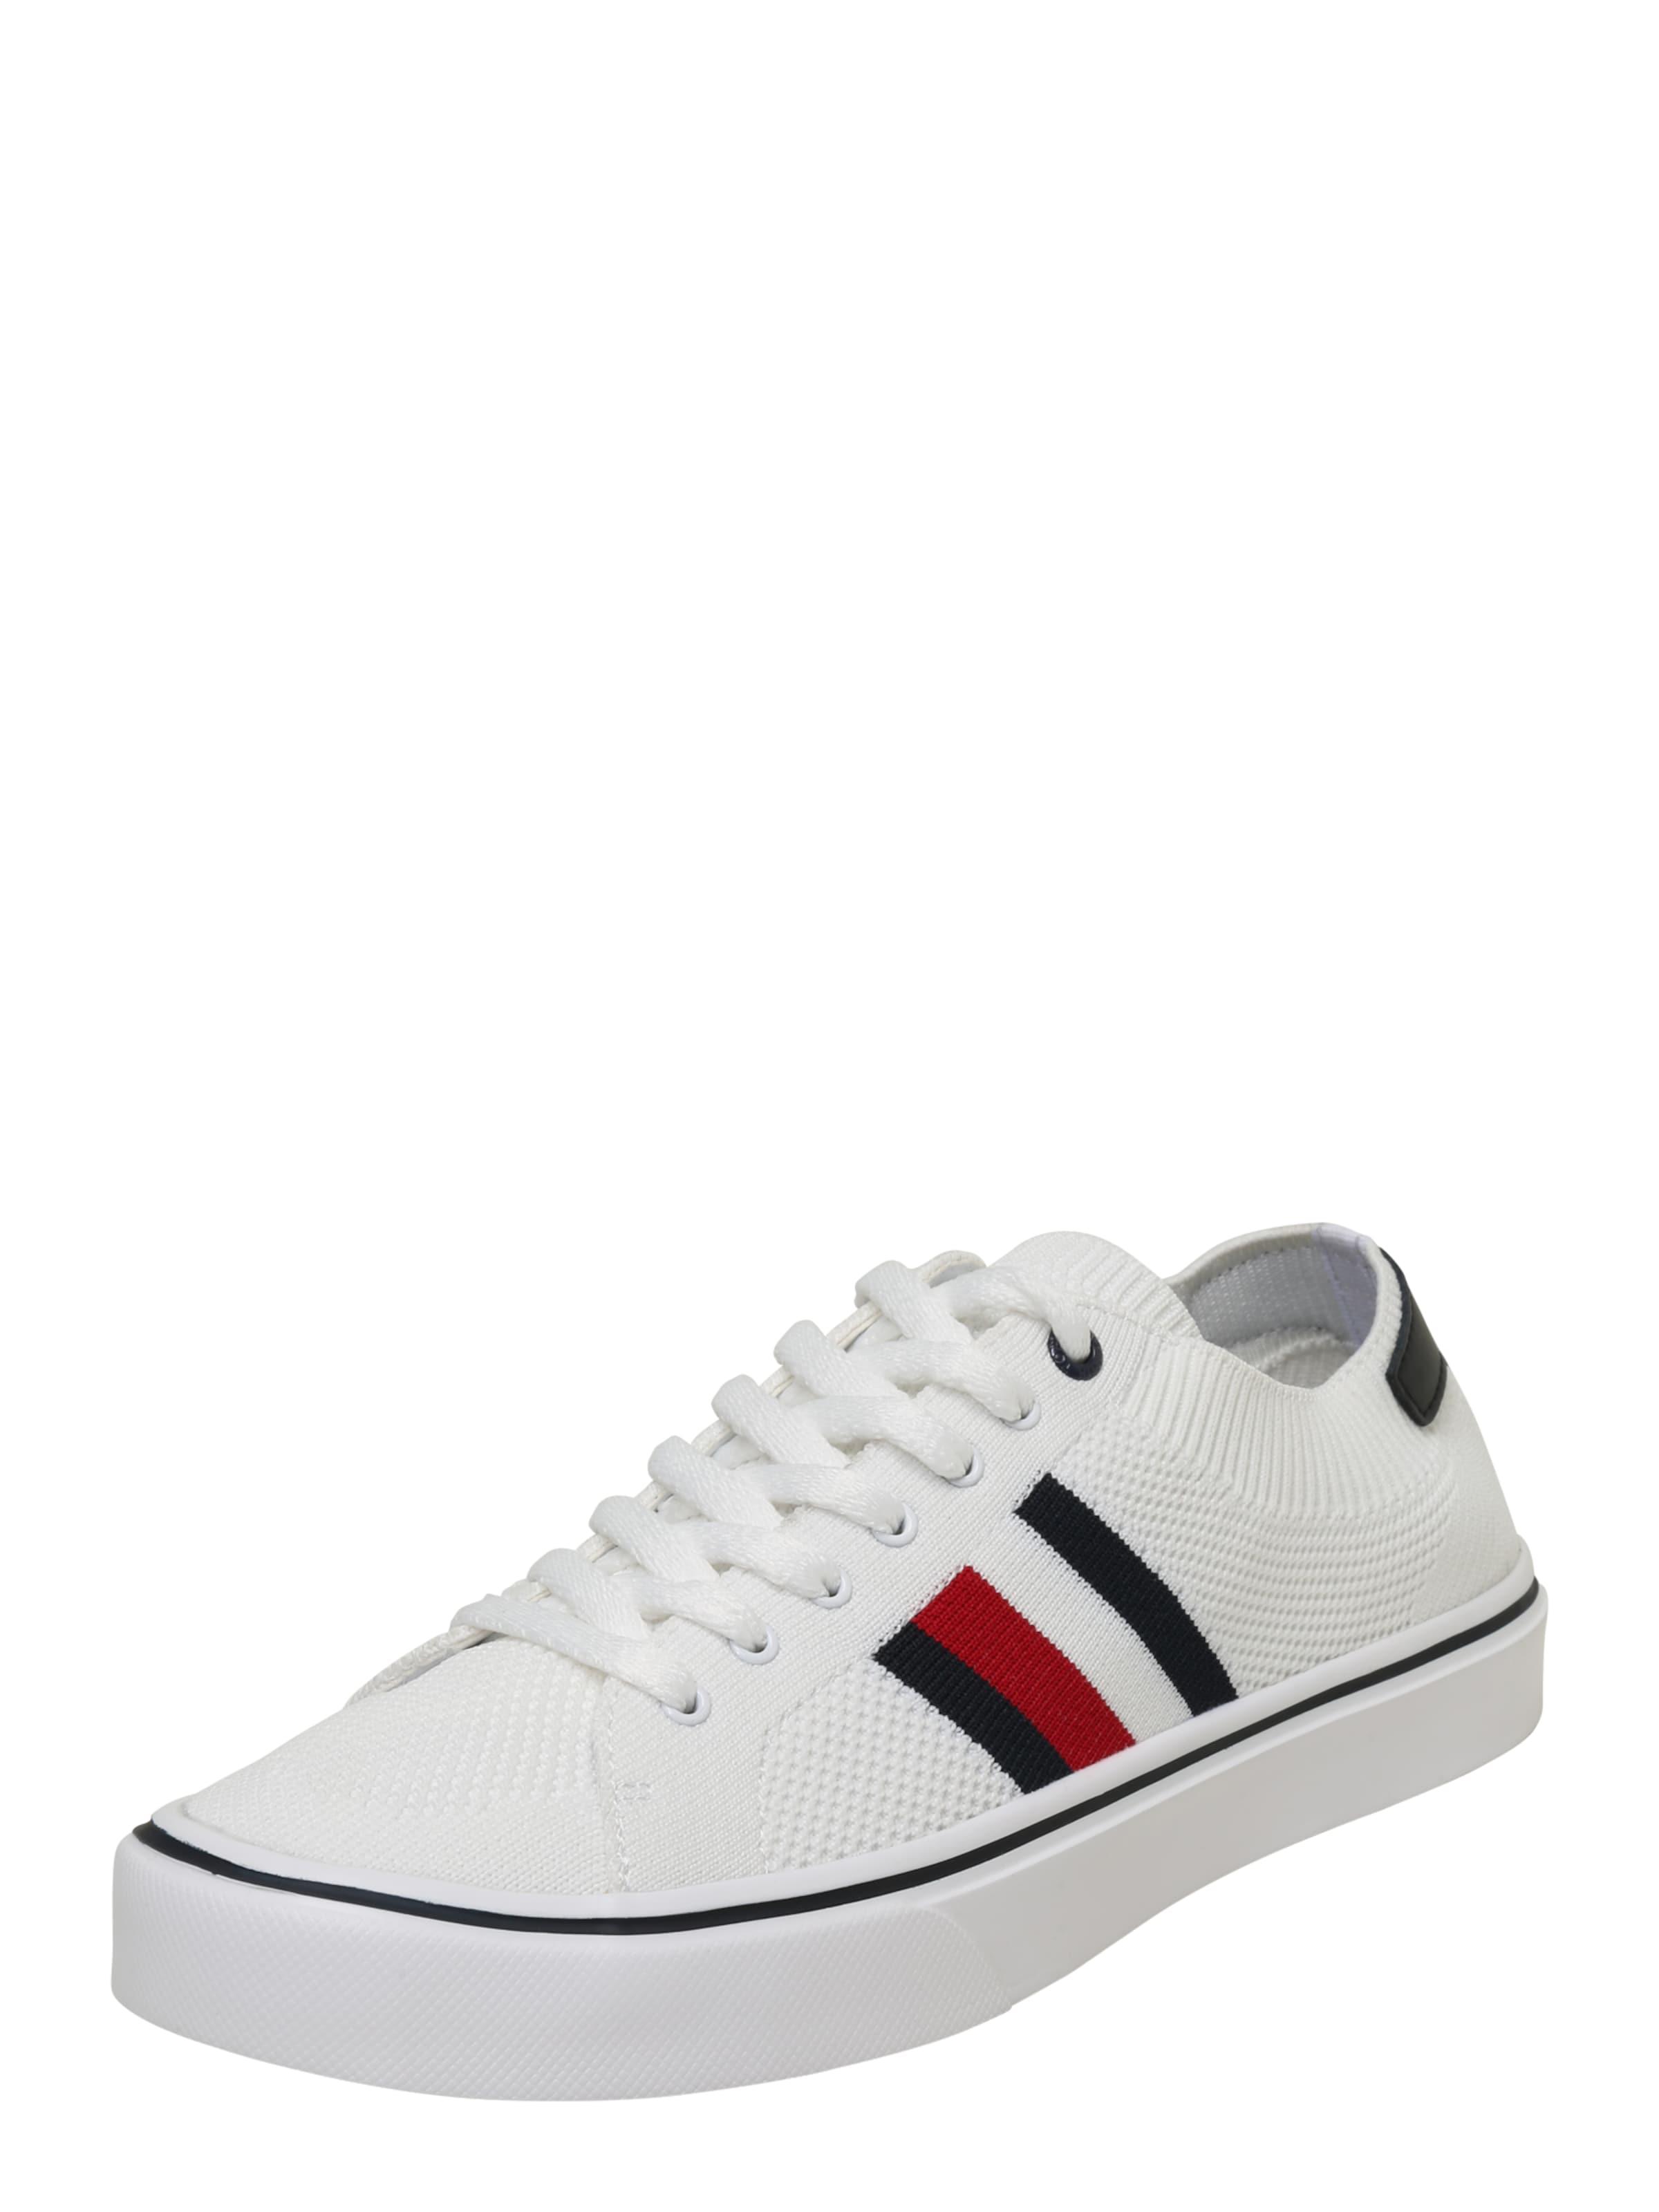 Haltbare Mode billige   Schuhe TOMMY HILFIGER   billige Sneaker 'CORPORATE' Schuhe Gut getragene Schuhe 98aab5